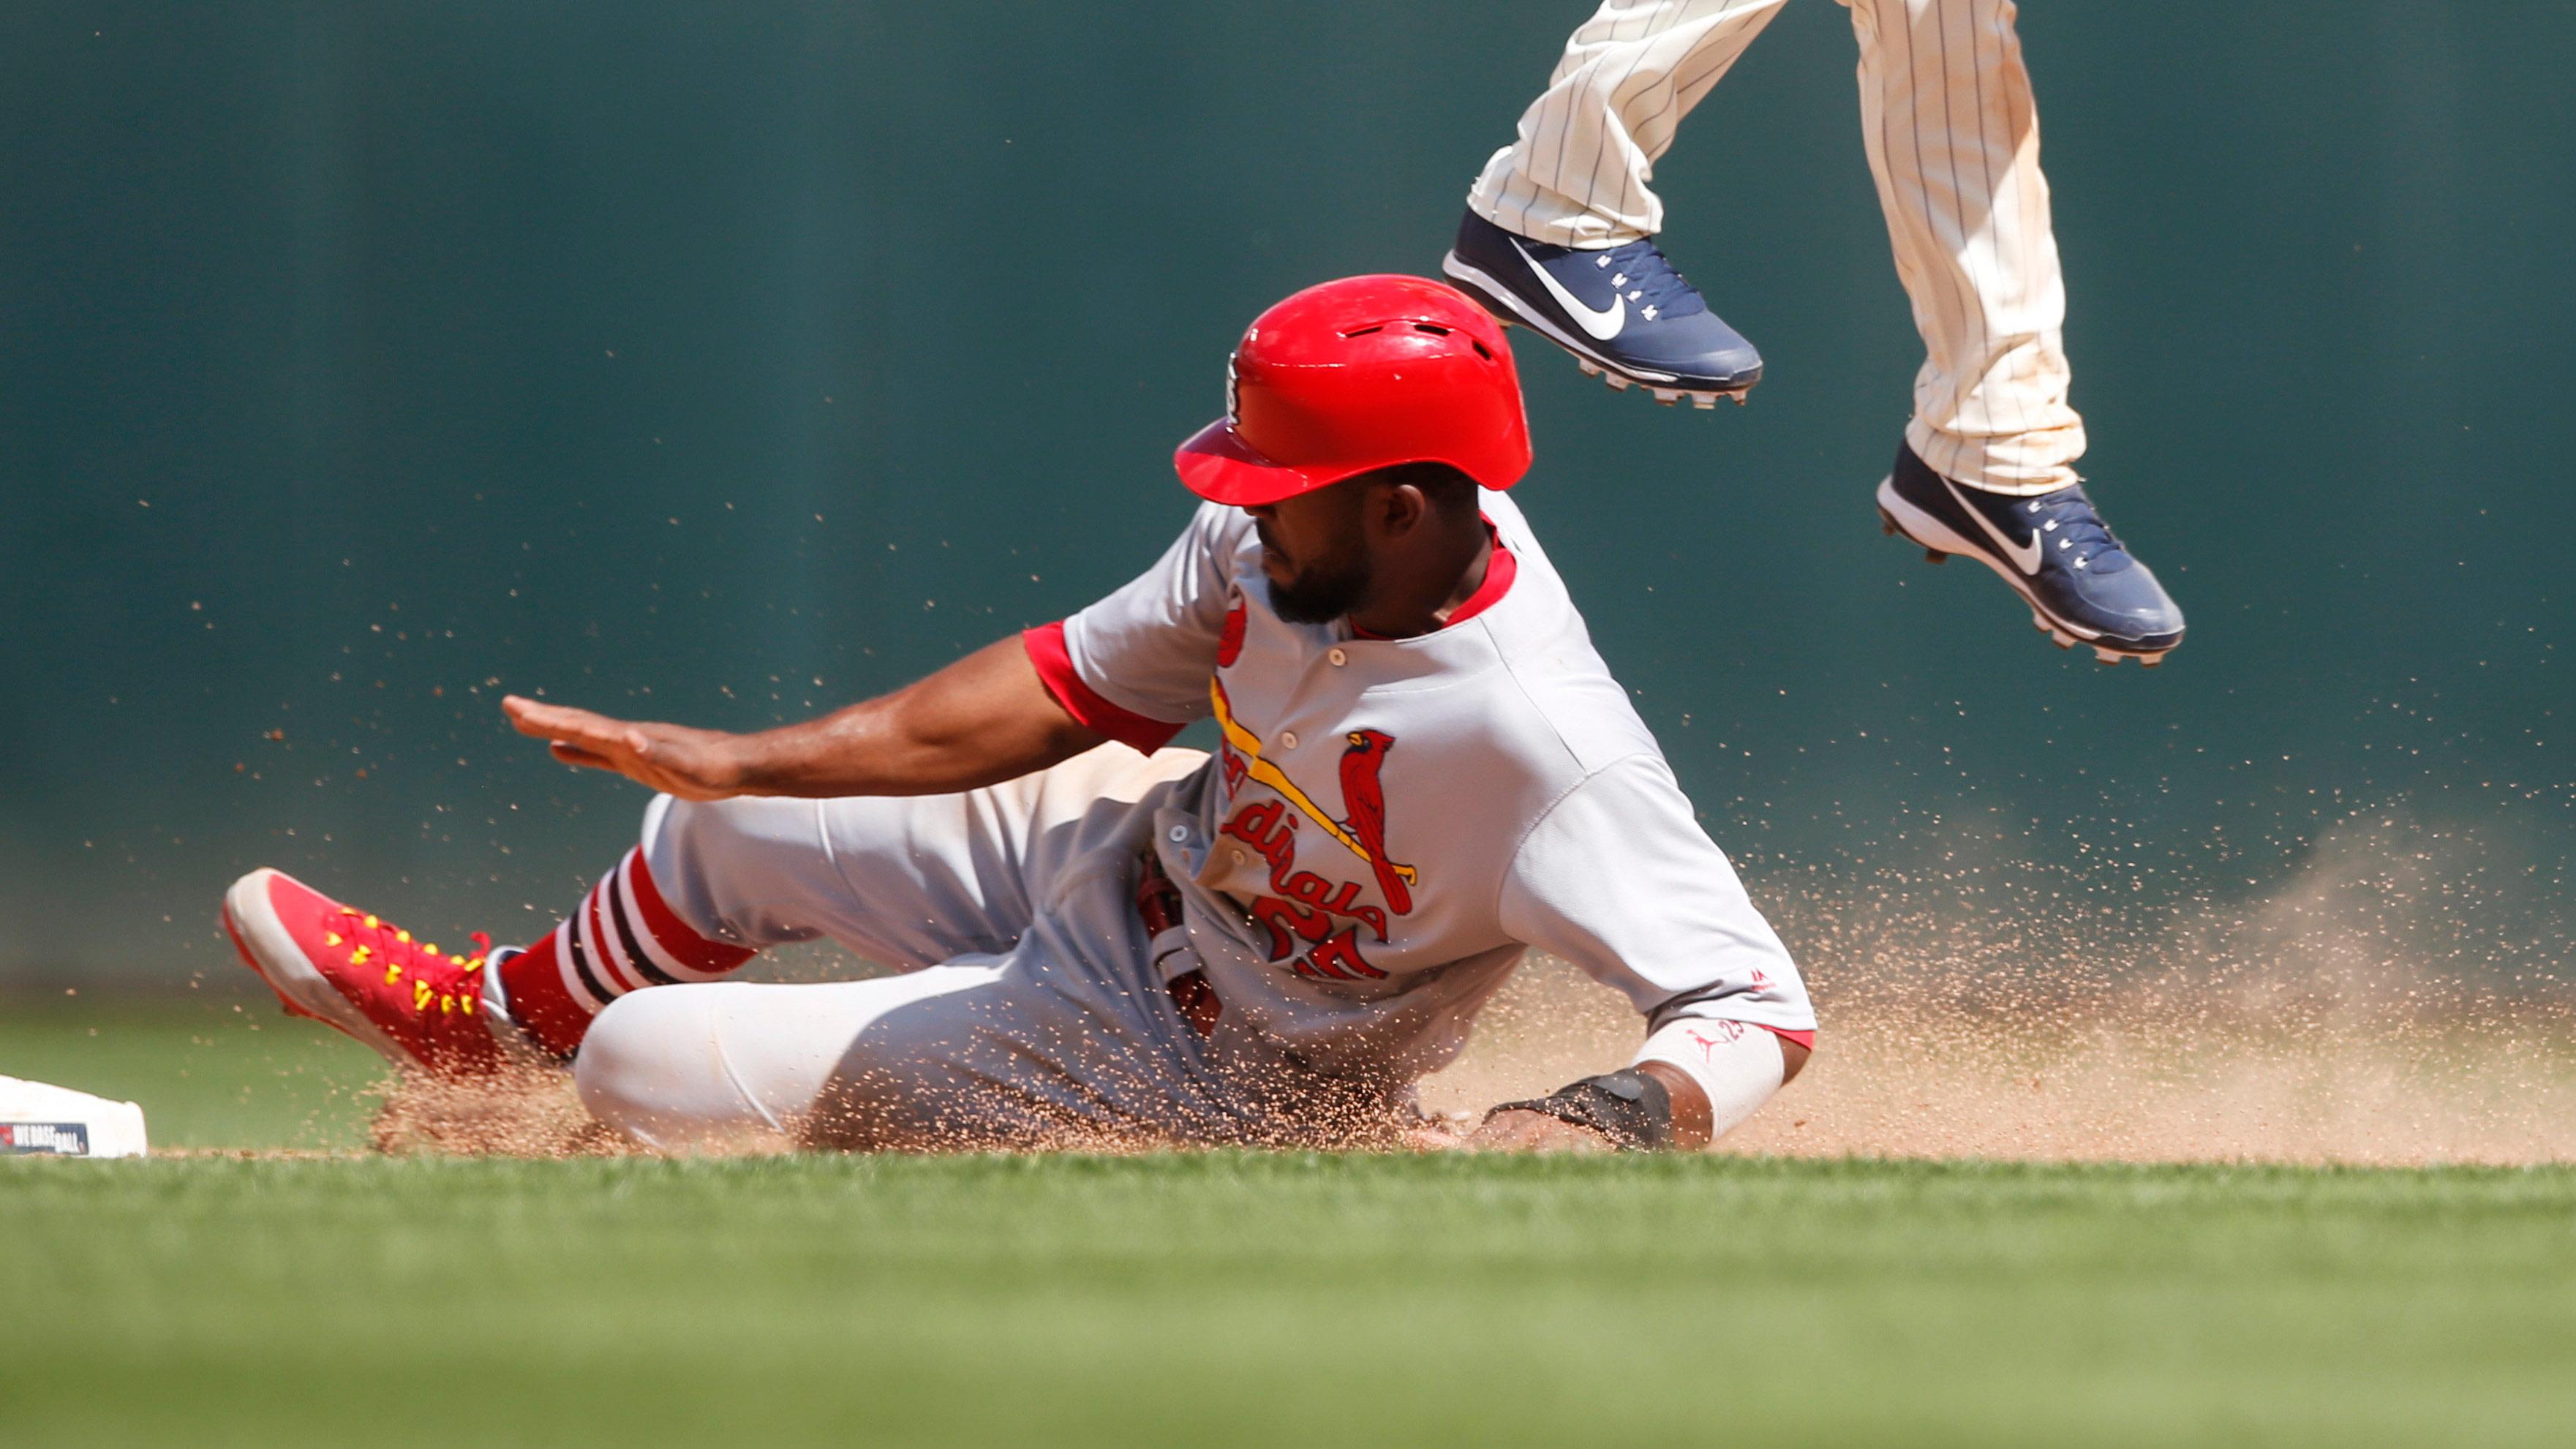 Cardinals transactions: Fowler back, O'Neill to DL, Bowman to Memphis